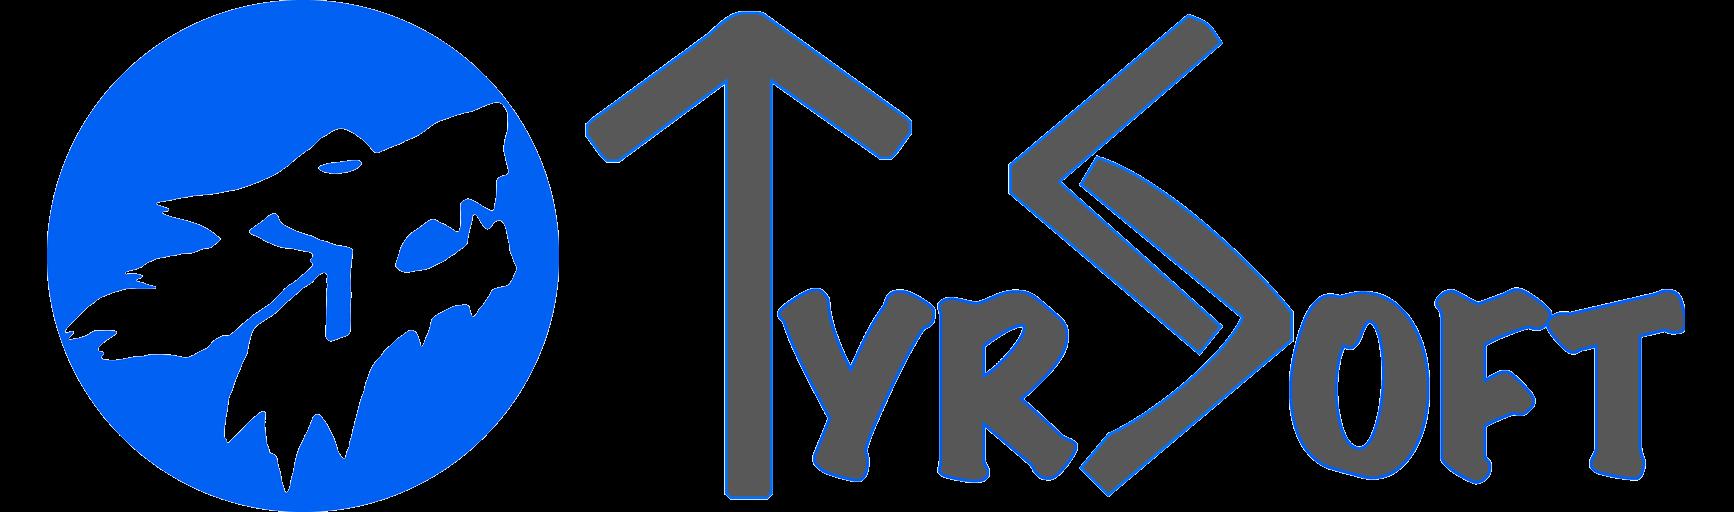 TyrSoft